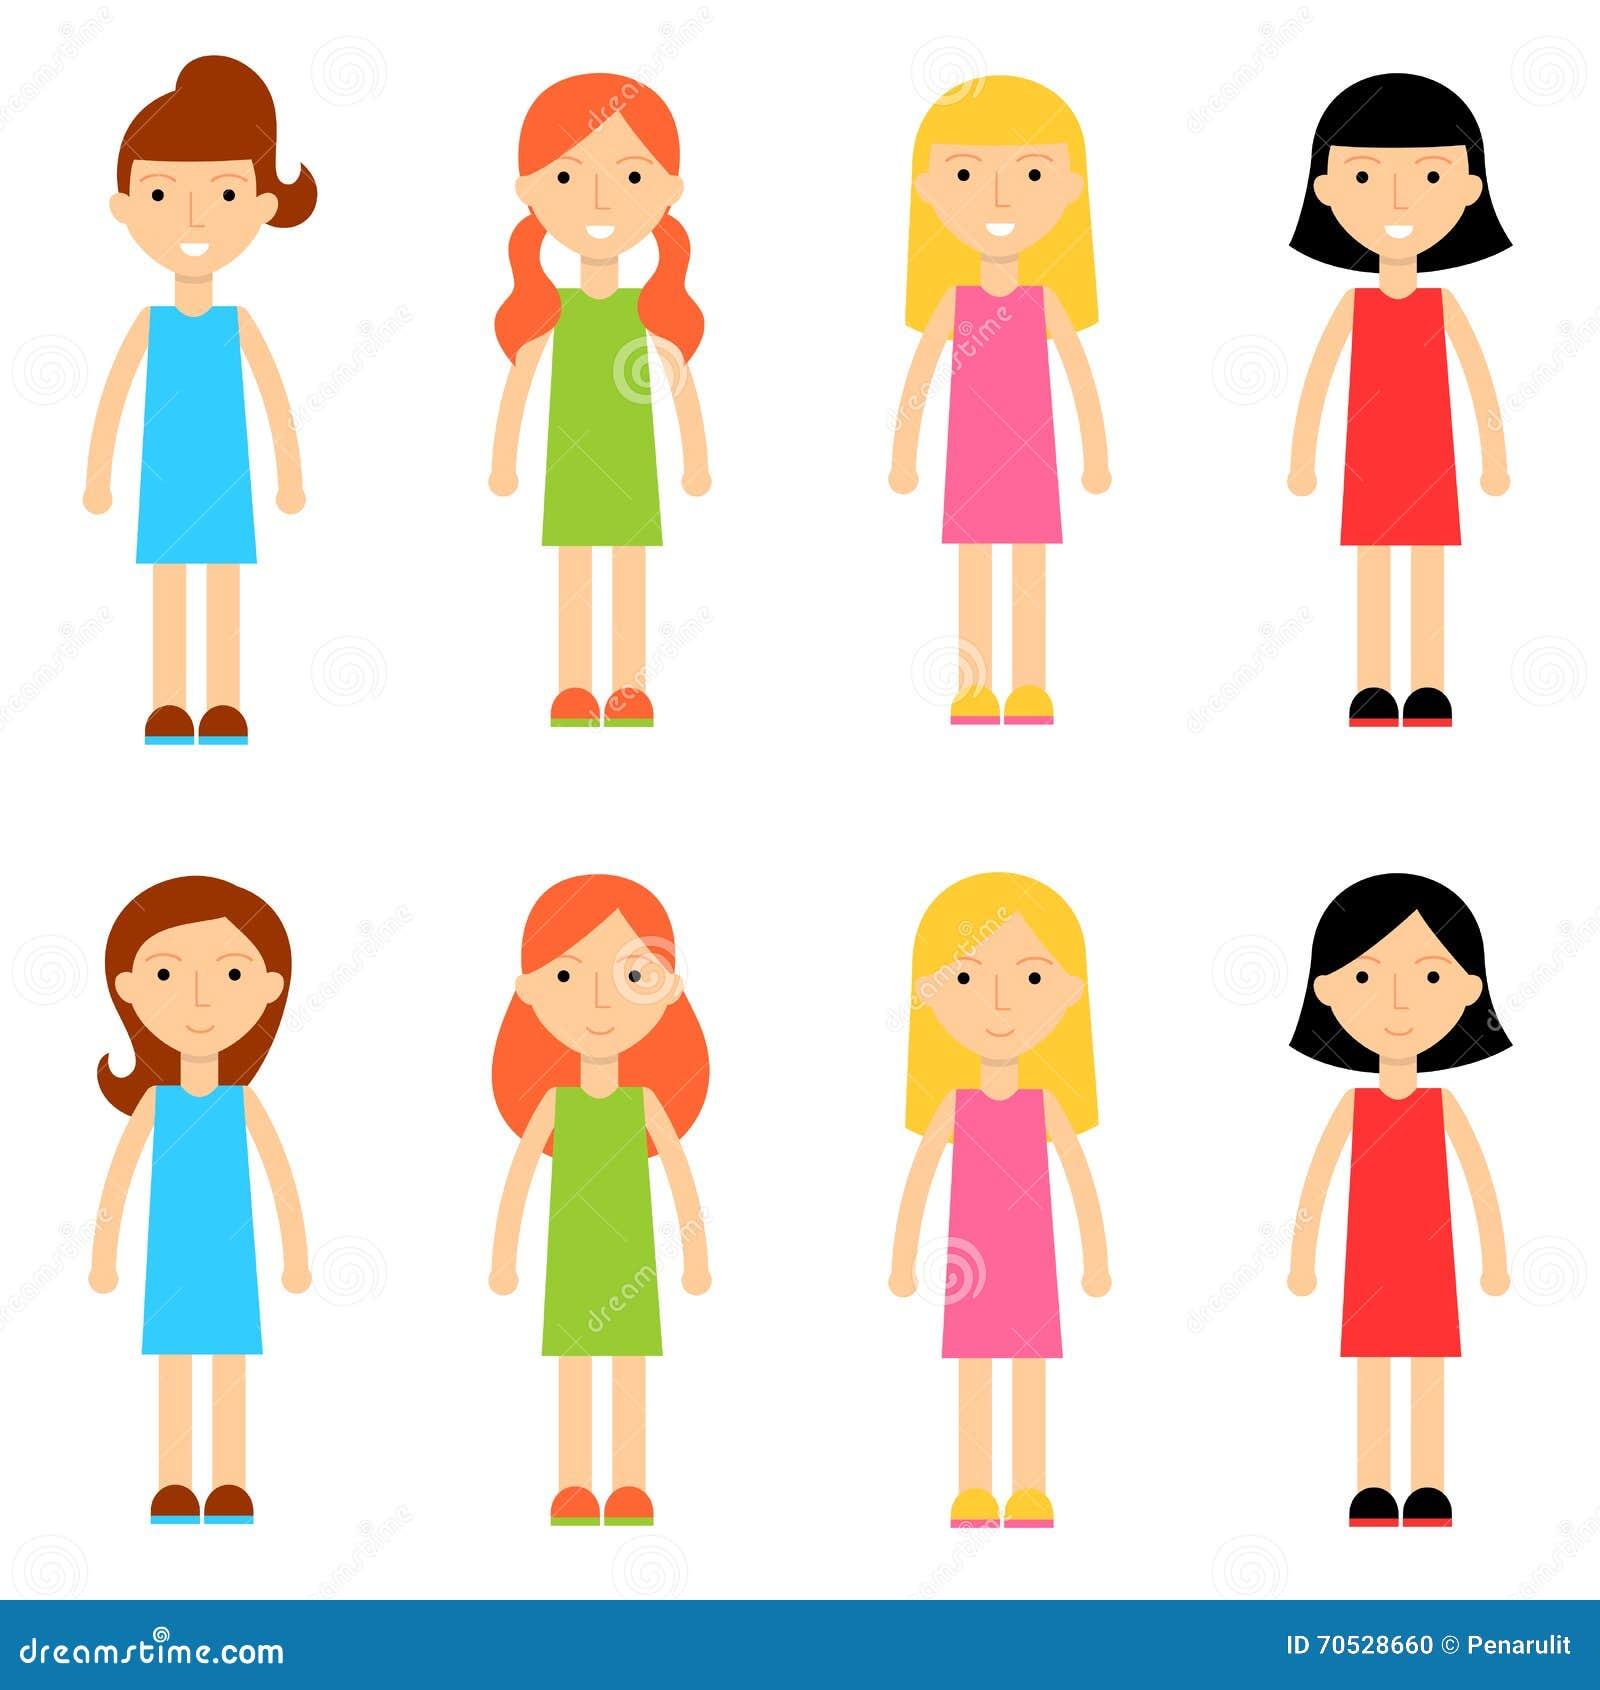 Vector Character Design Illustrator : Flat cartoon girl characters collection stock vector